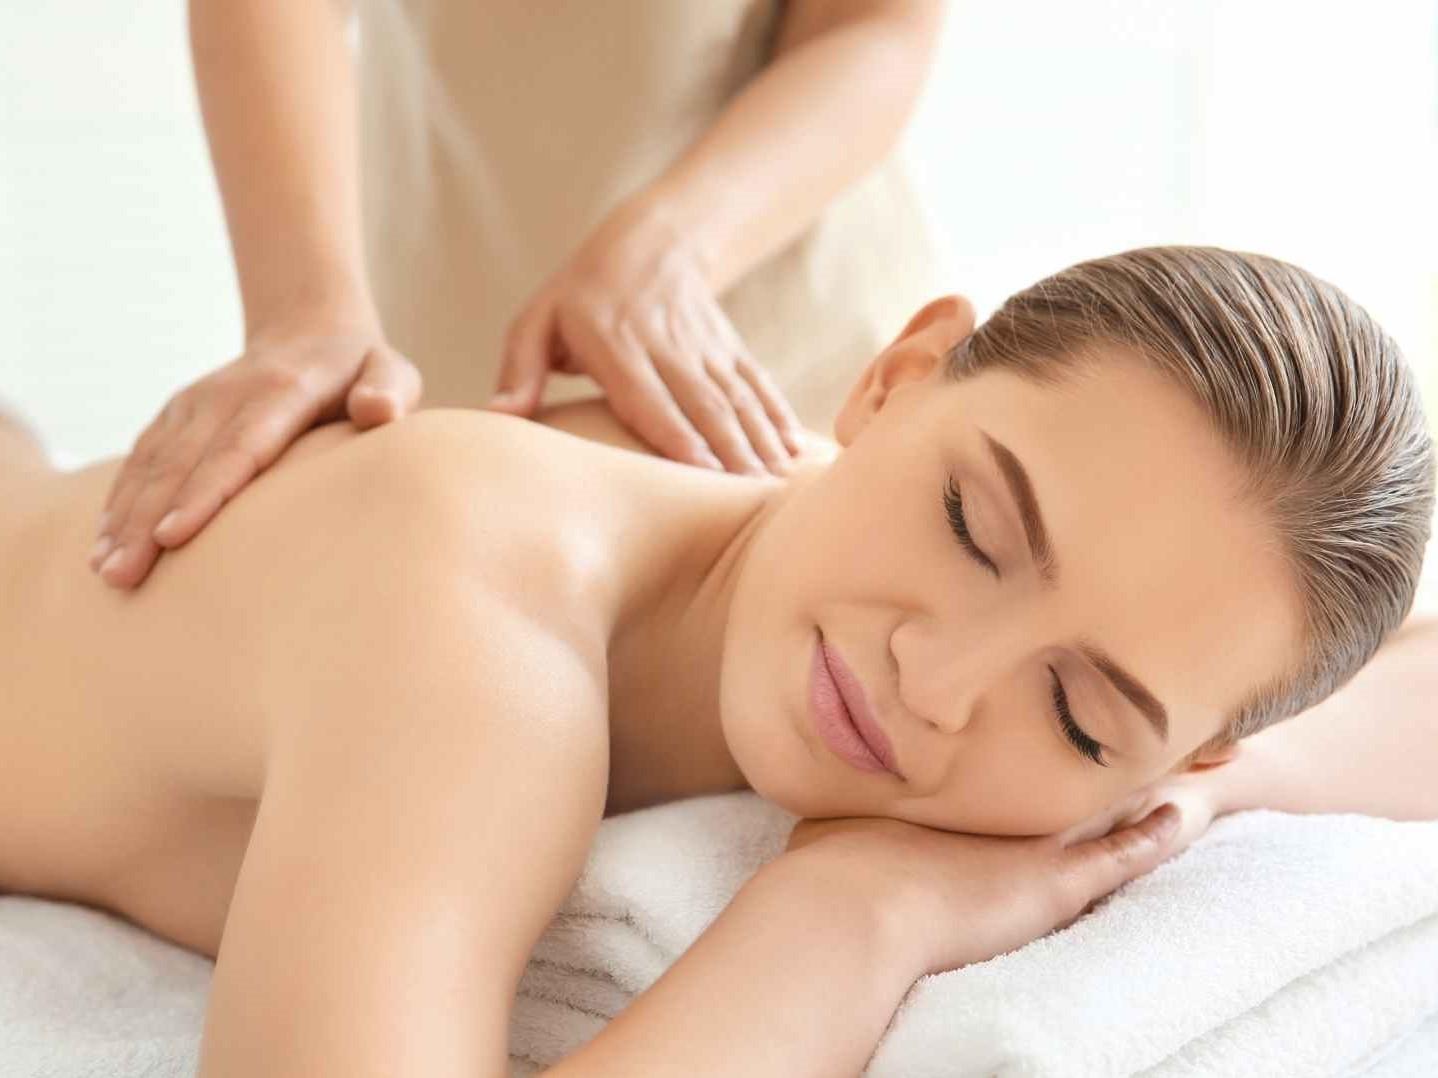 Zertifizierte Wellness Massage Ausbildung bei der Master Wellness Akademie